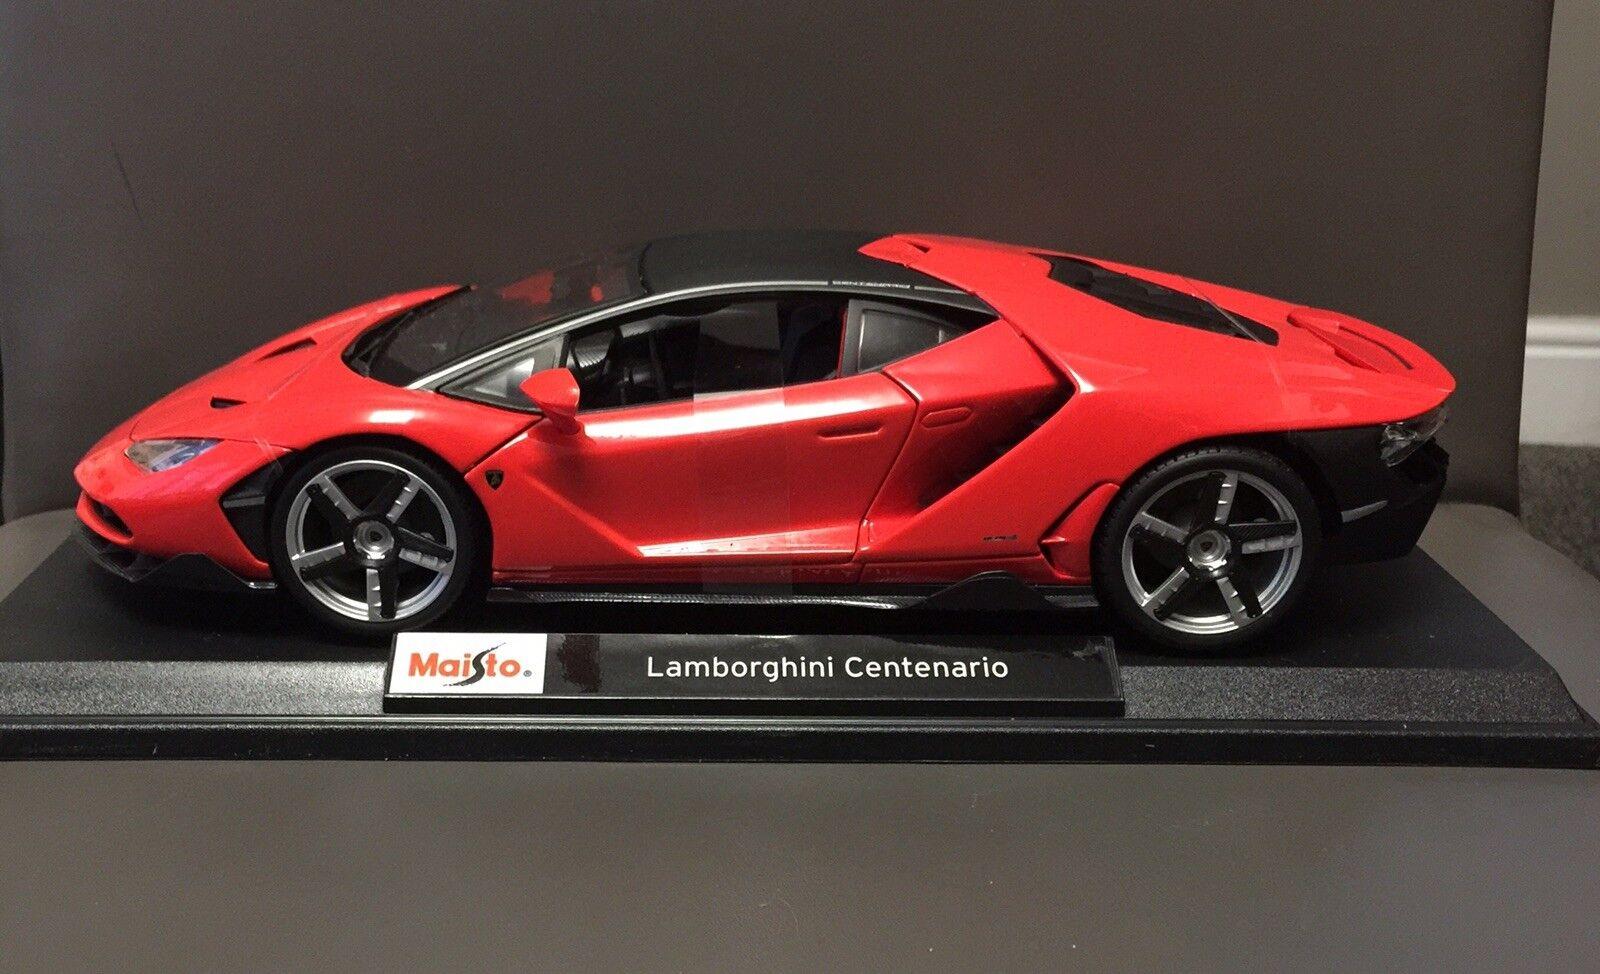 Maisto Lamborghini Centenario 1 18 18 18 Diecast Modelo Coche Nuevo y en caja 8a85d9